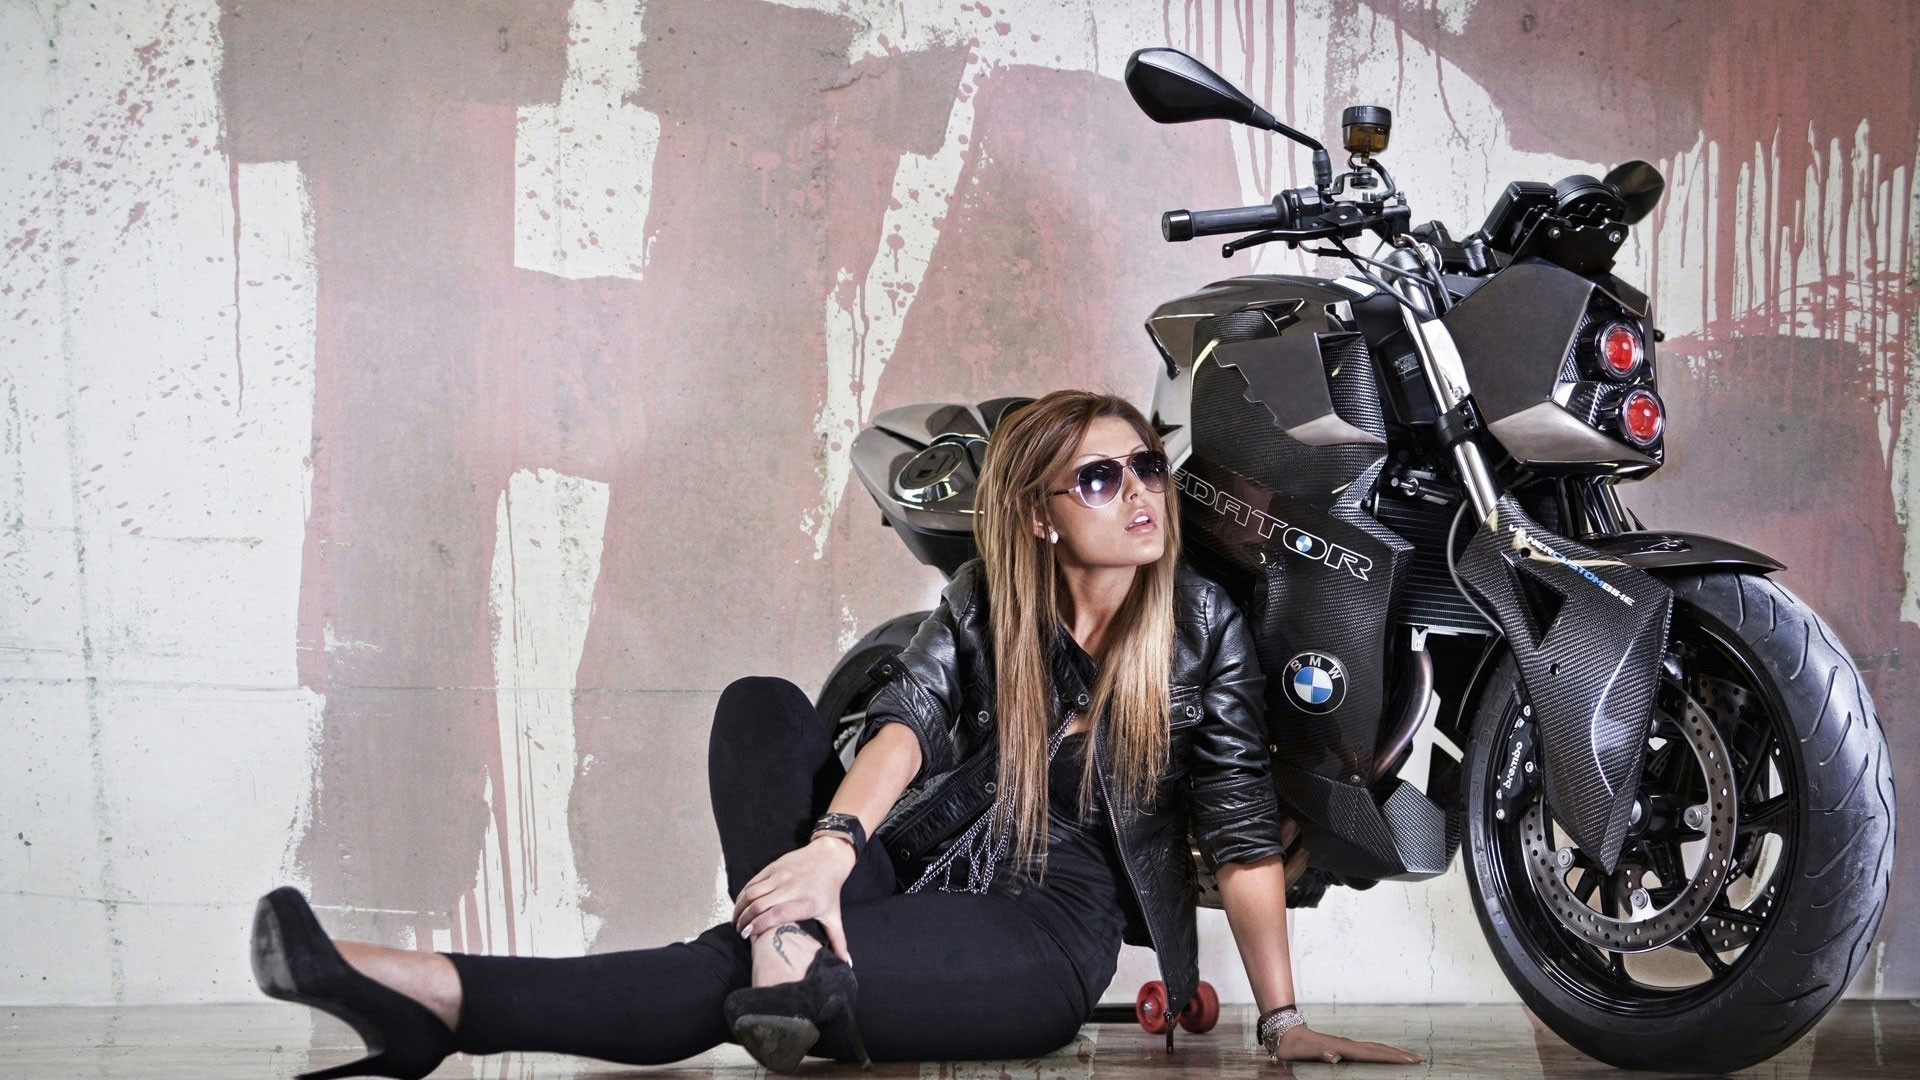 hd pics photos beautiful girl bike motor cycle bmw predator stunning hd  quality desktop background wallpaper